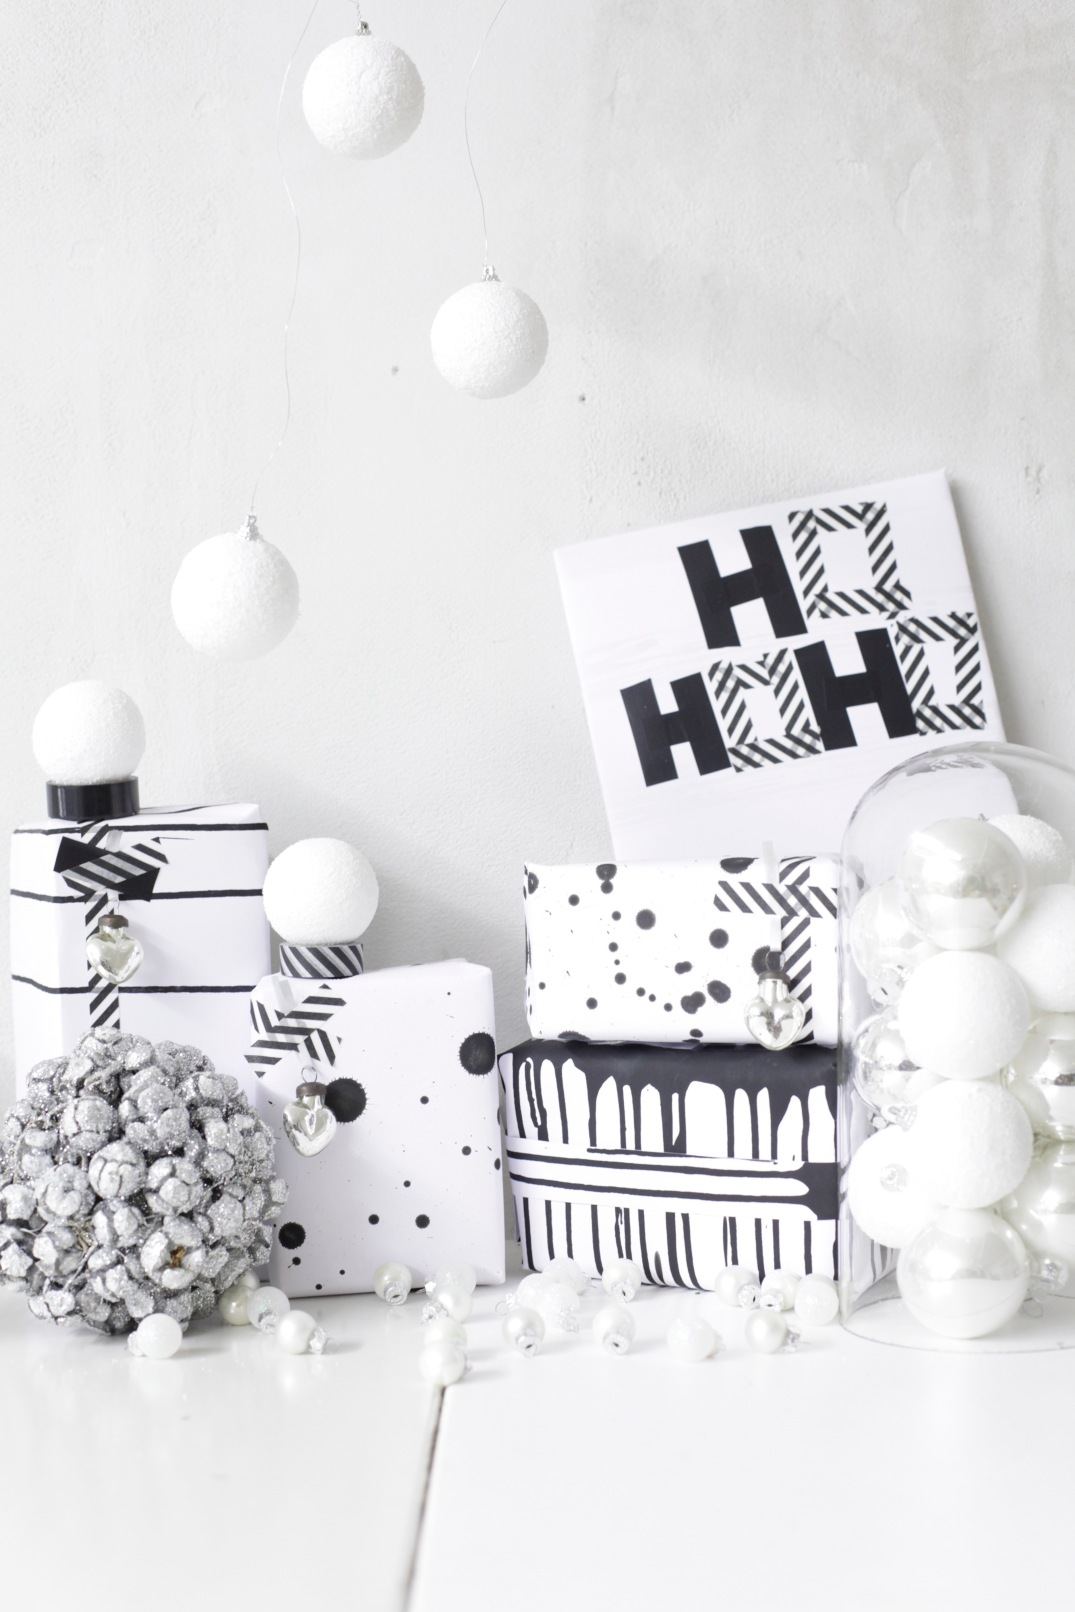 DIY Christmas paper via Anastasia Benko